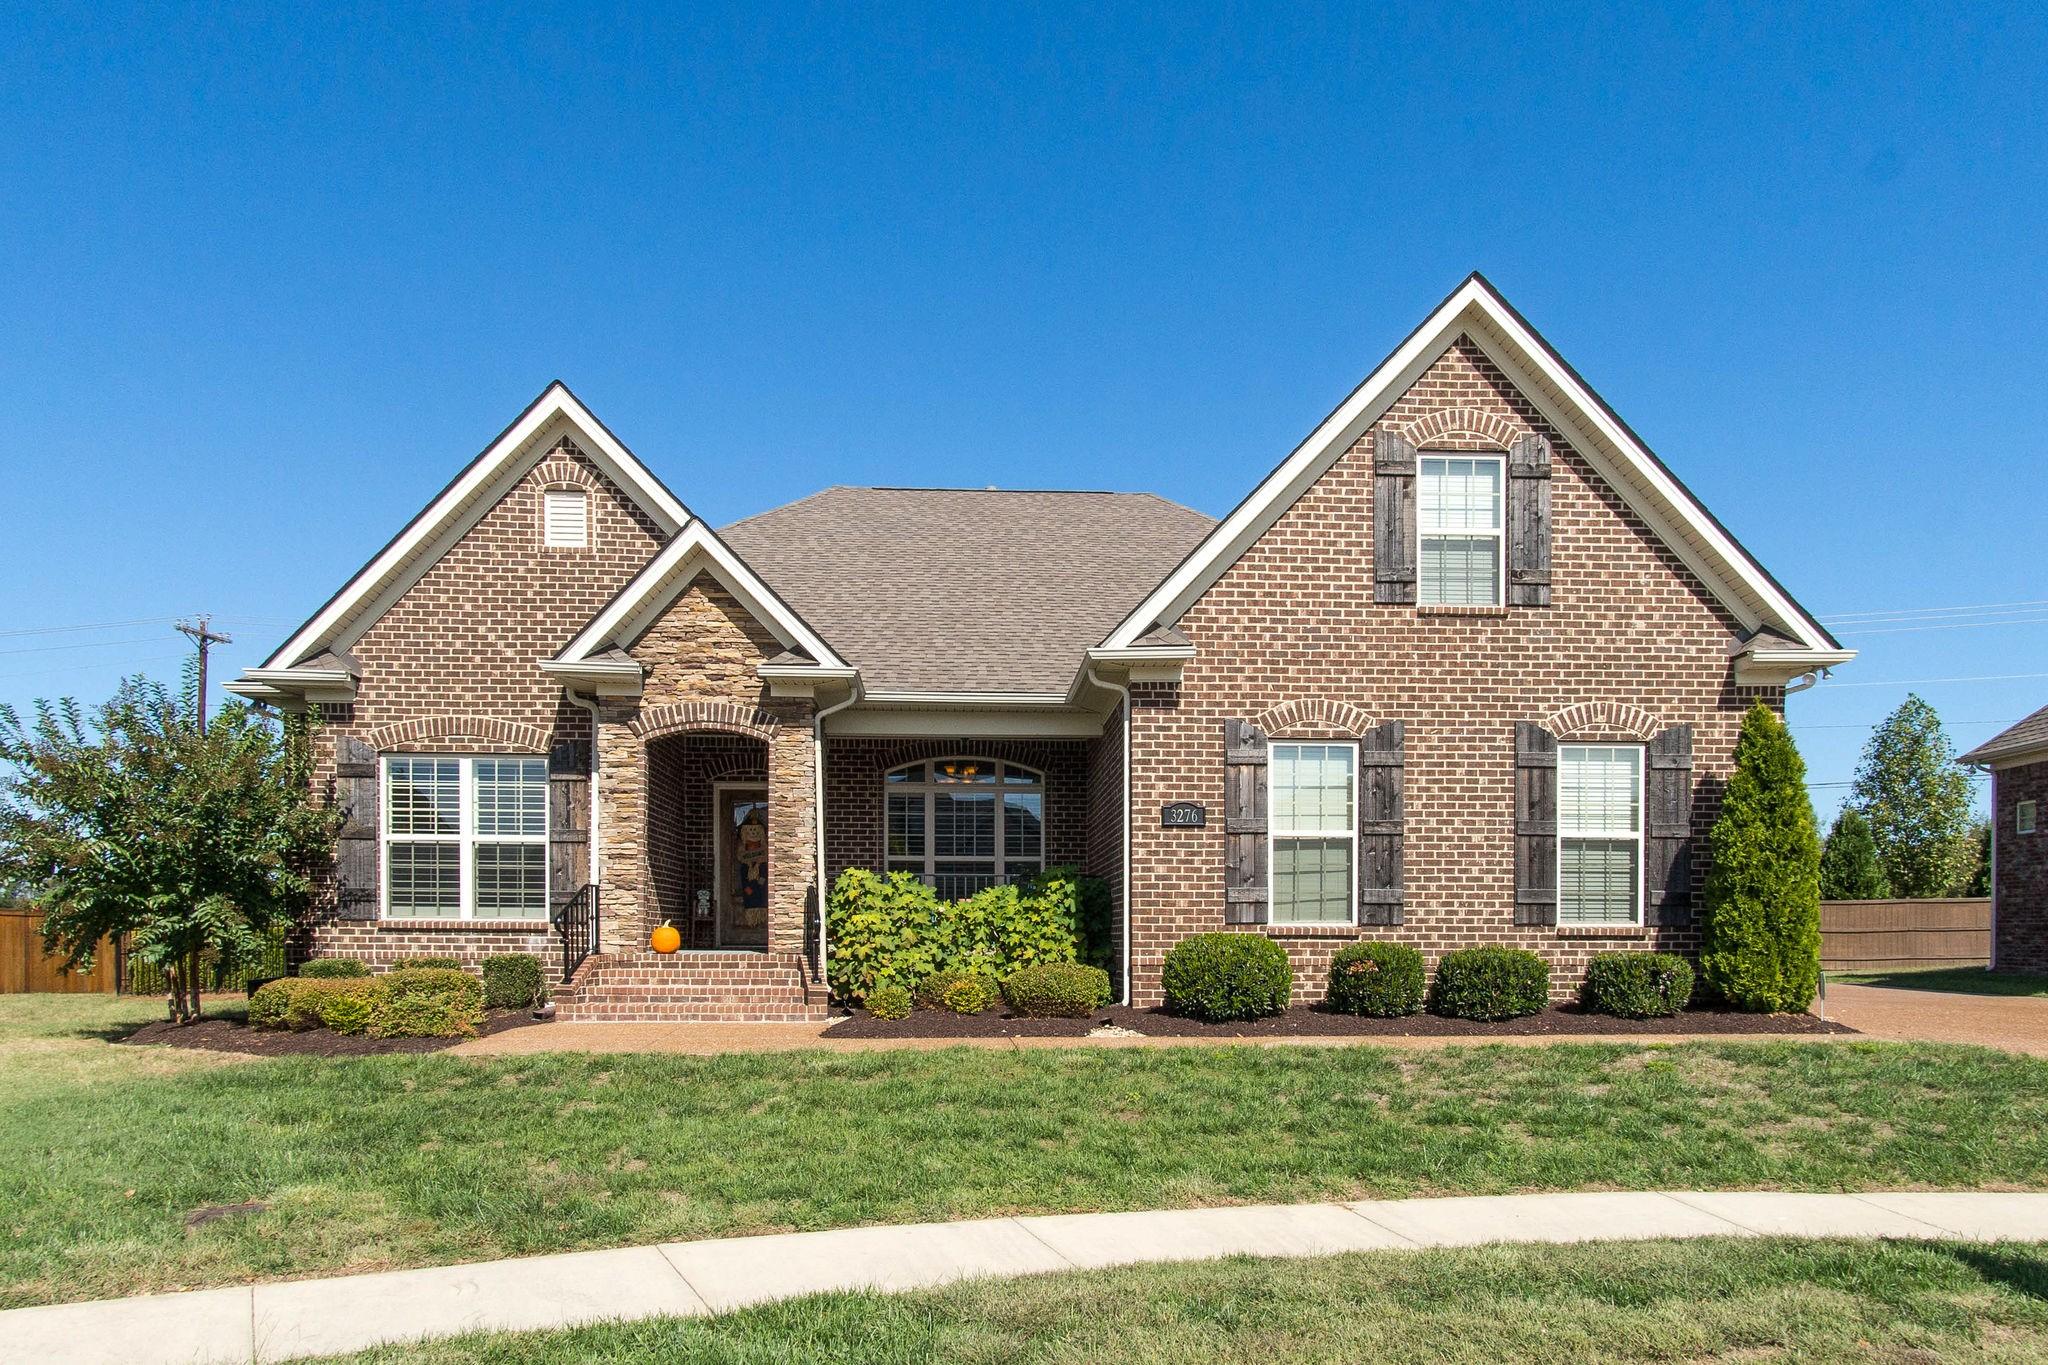 2830 Bransford Ave Property Photo - Nashville, TN real estate listing